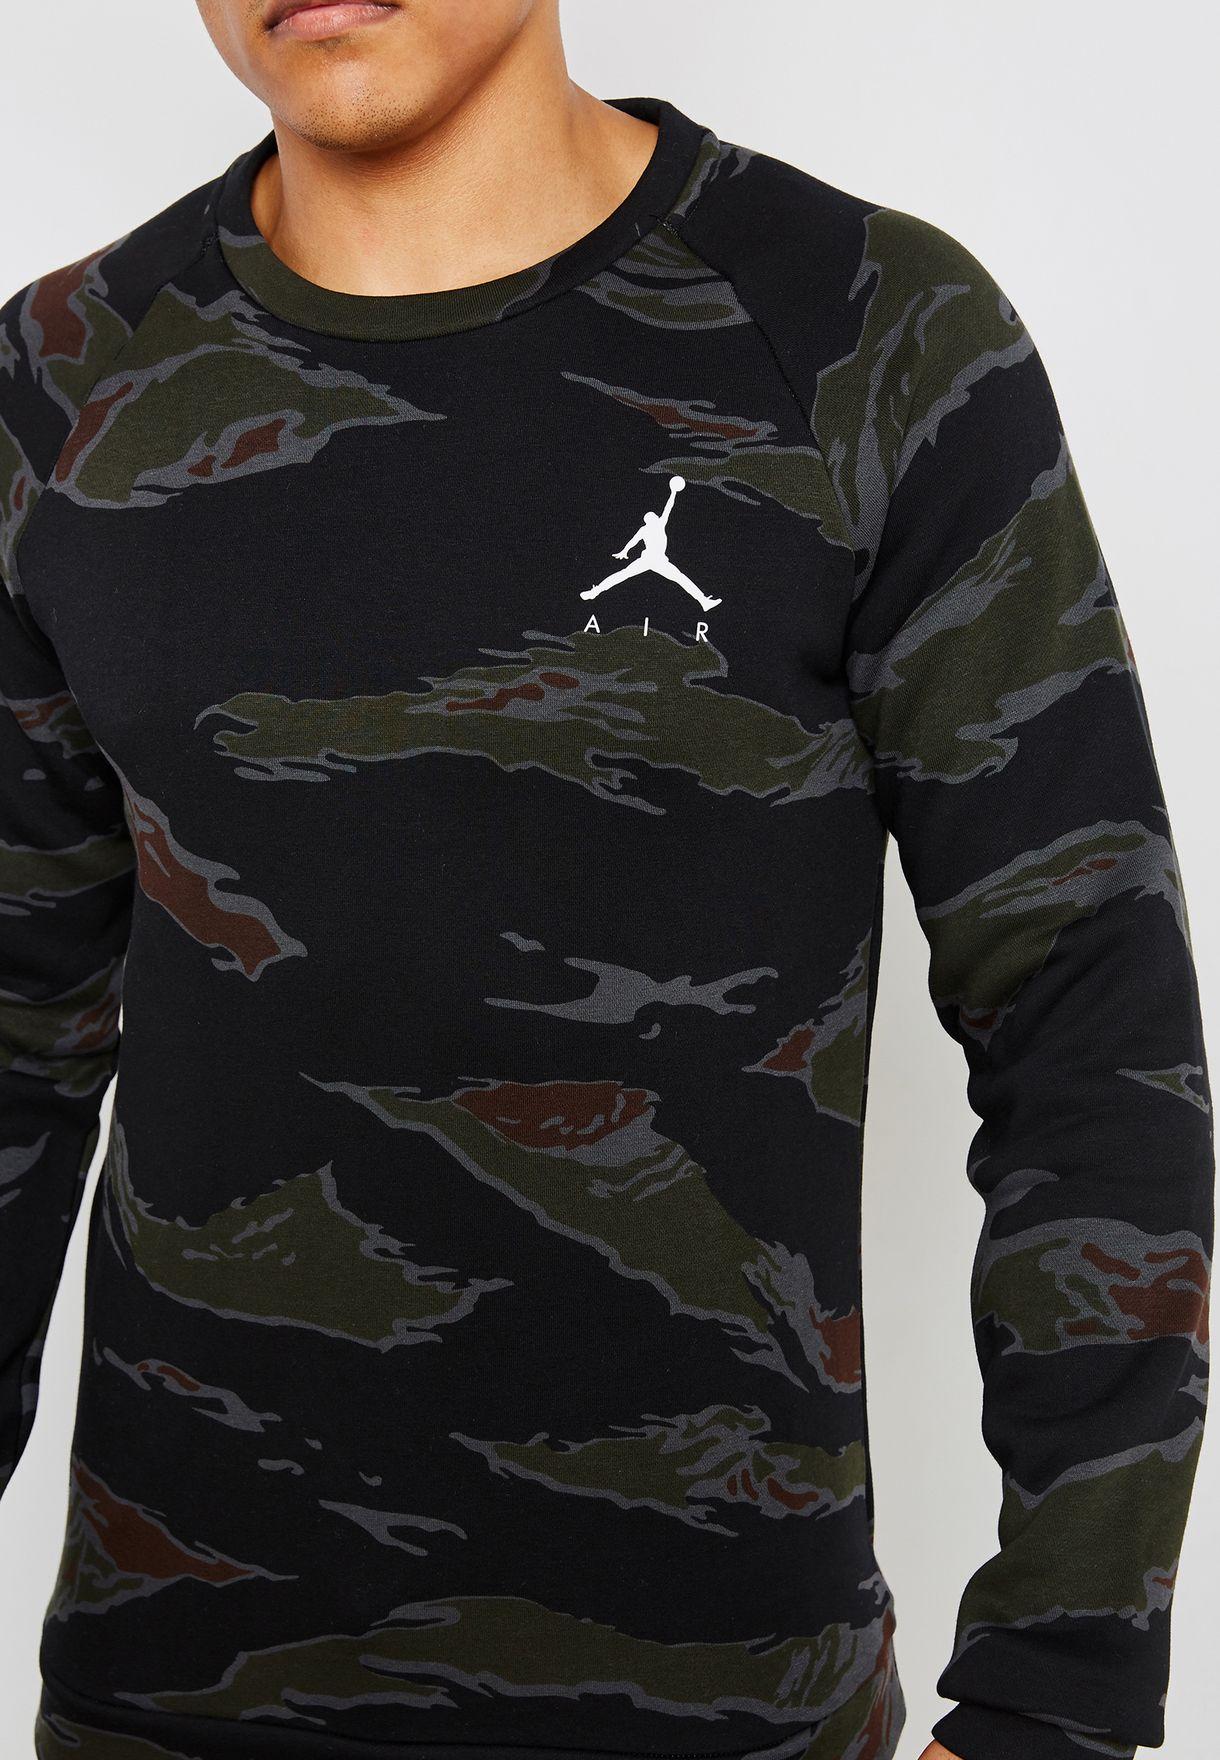 big sale ad7e7 71081 Jordan Jumpman Fleece Camo Sweatshirt